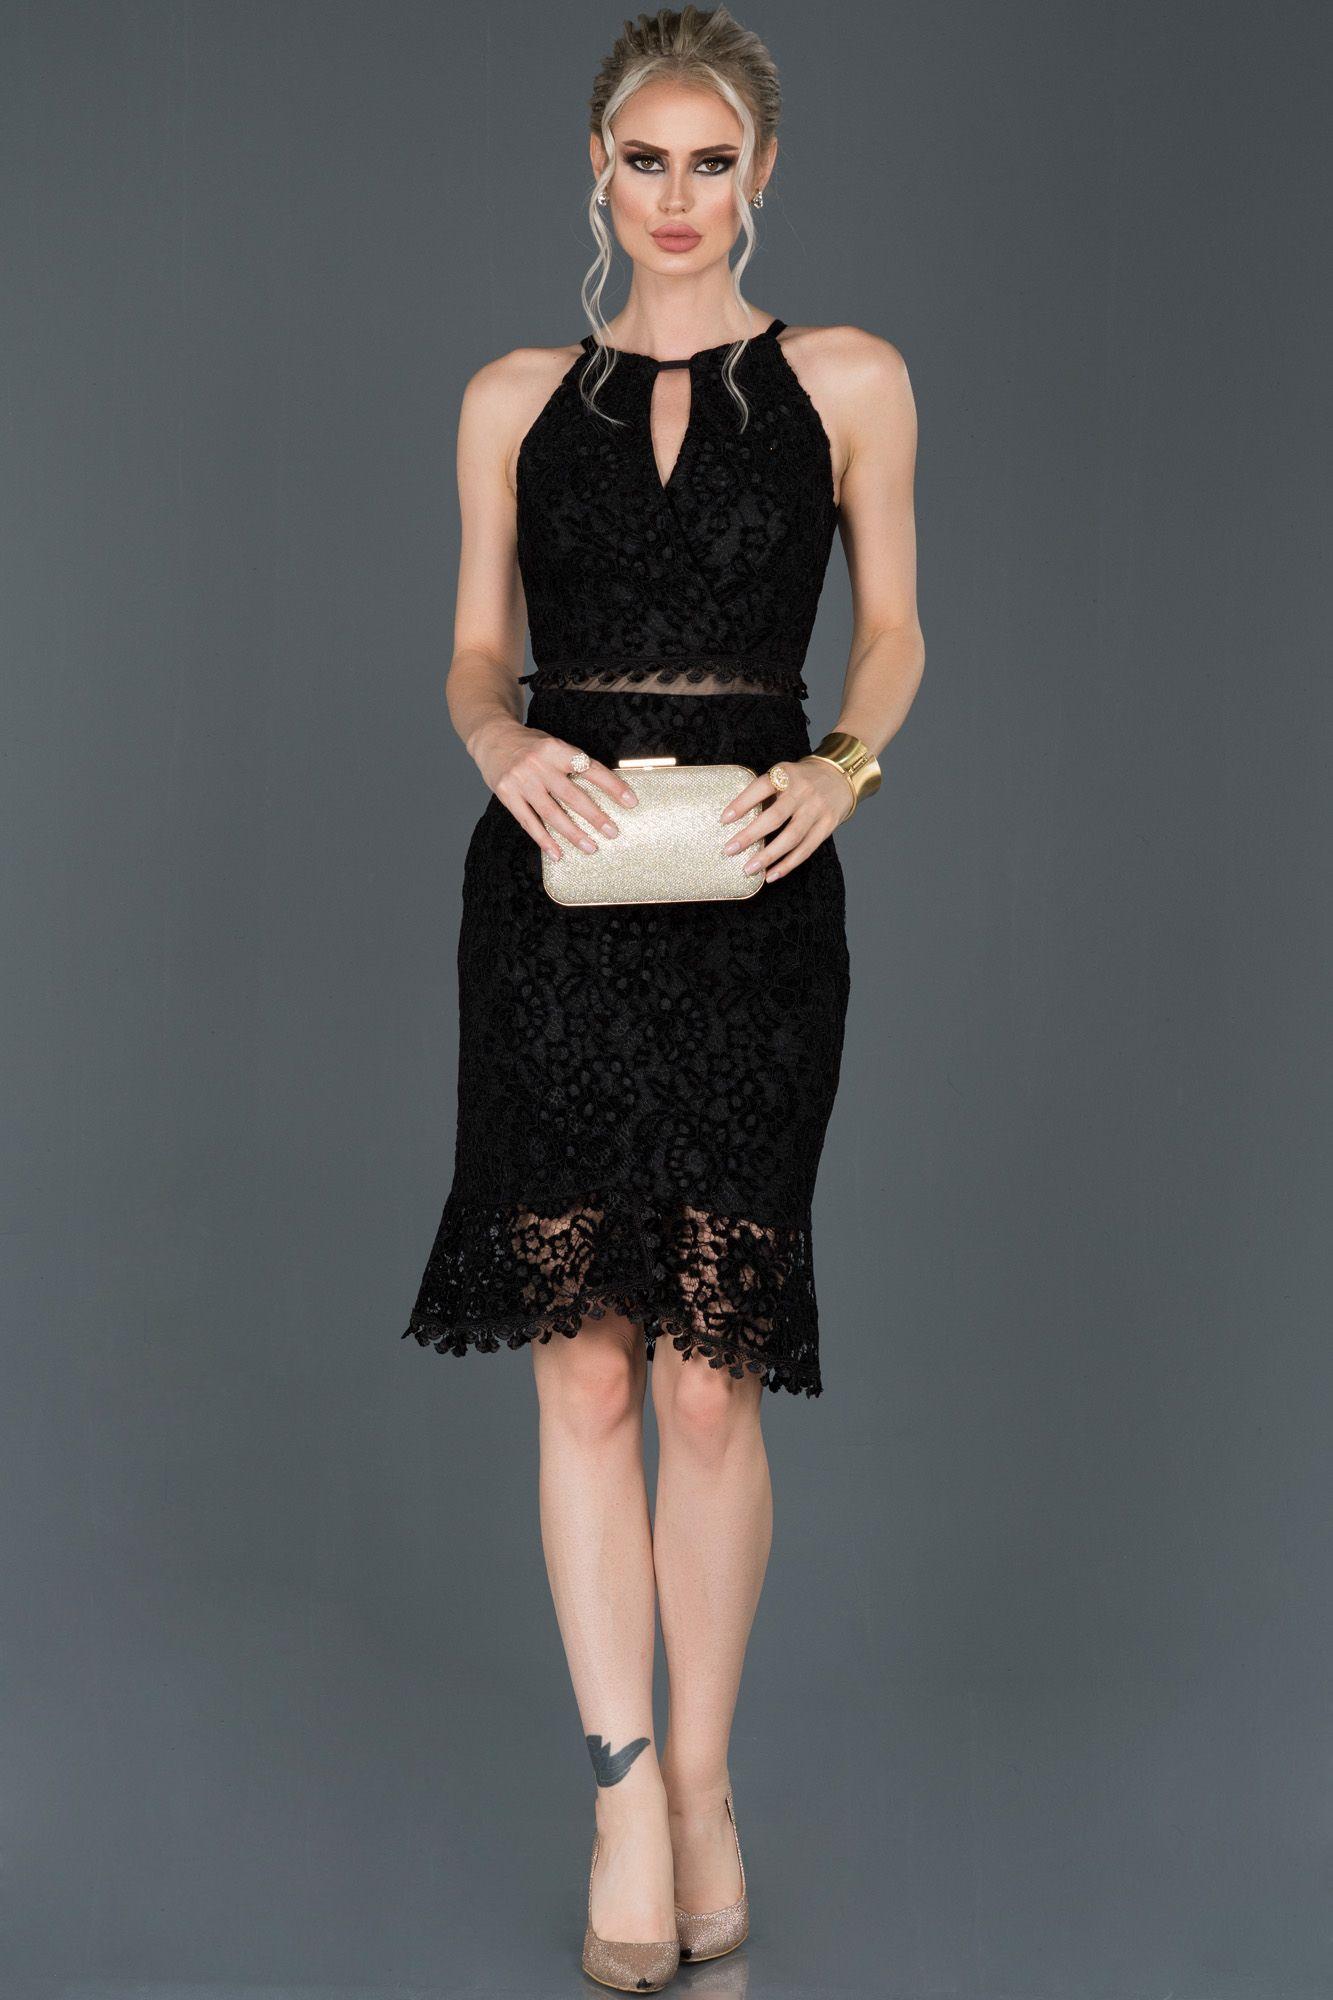 Siyah Kisa Gupurlu Kadife Davet Elbisesi Abk634 2020 Elbise The Dress Elbise Modelleri